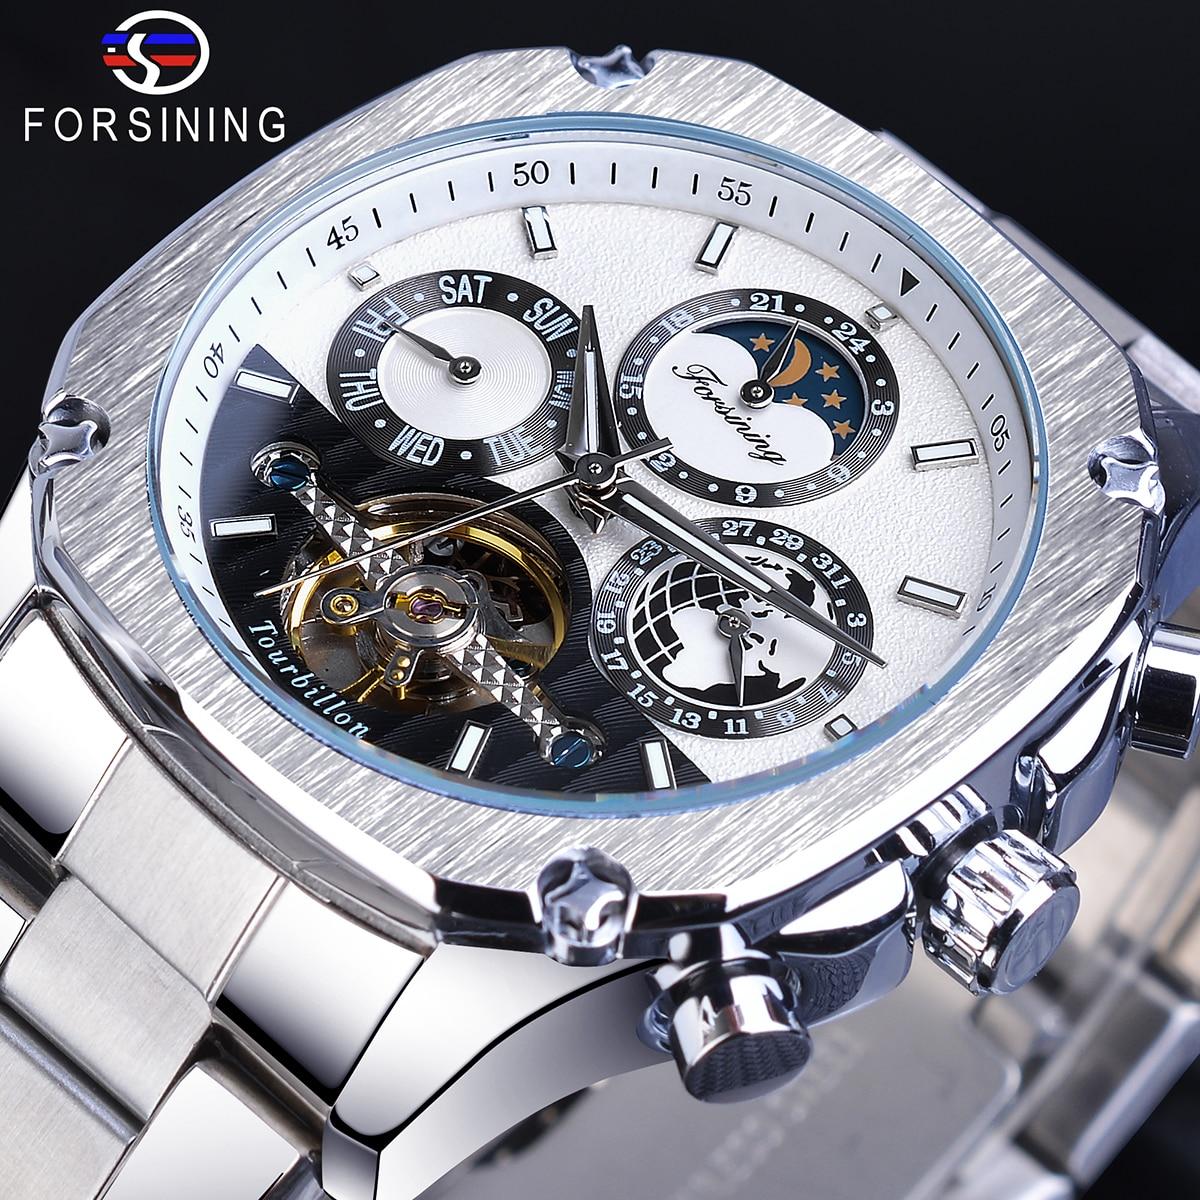 Forsining Square Men Mechanical Watches Tourbillon Moon Phase Calendar Automatic Business Dress Stainless Steel Belts Wristwatch